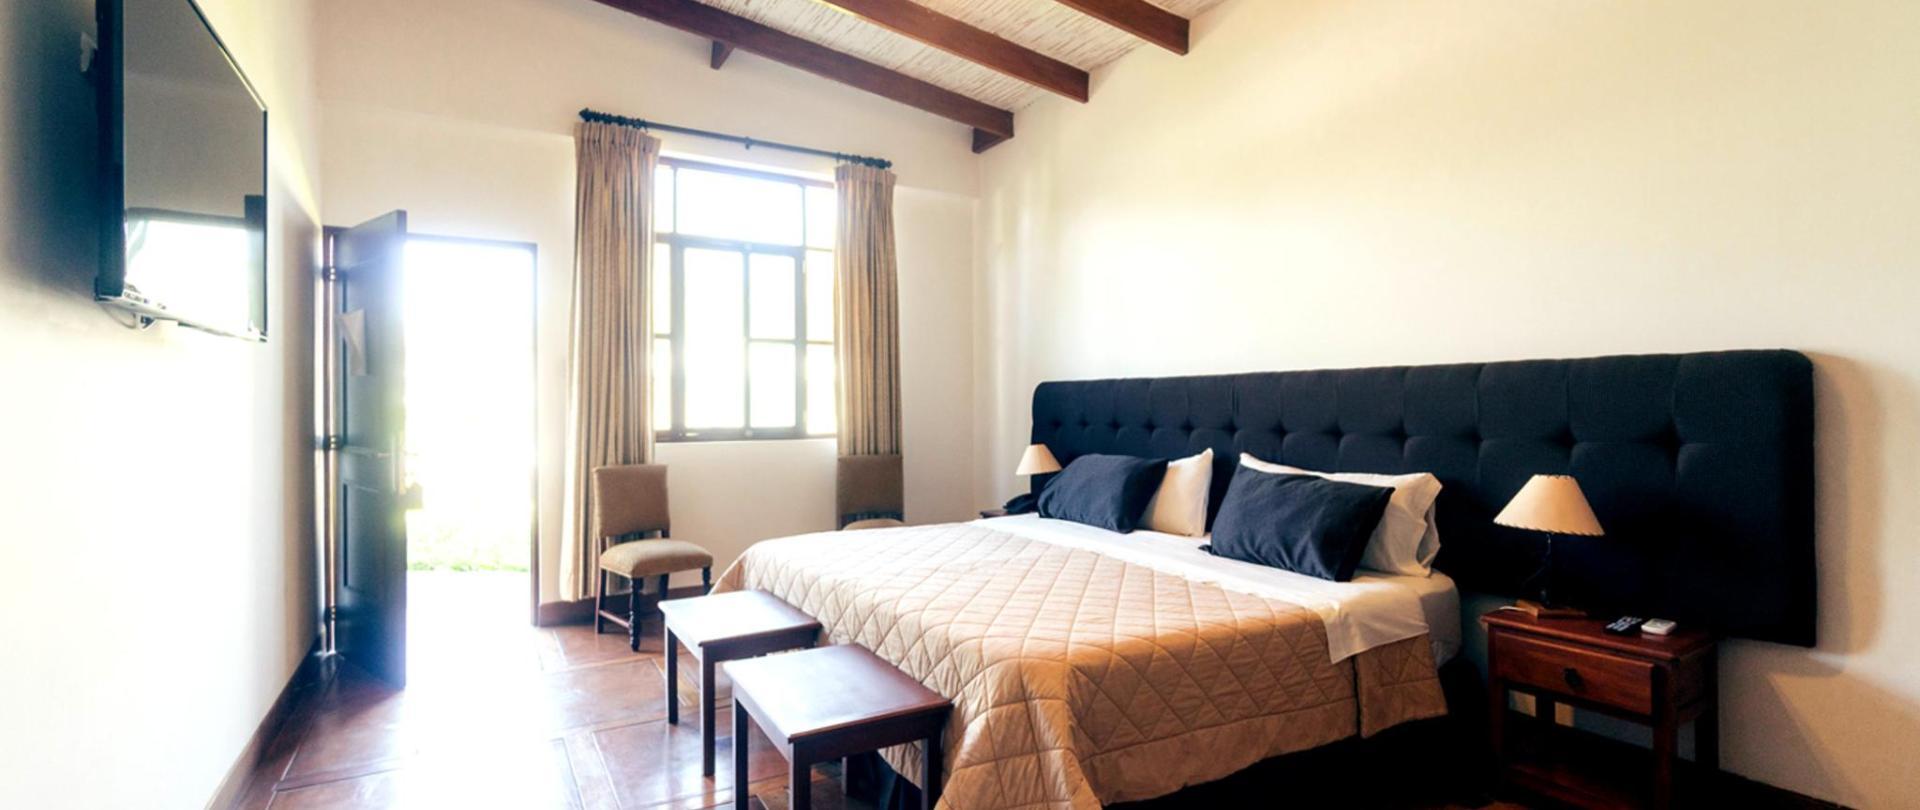 Casa Hacienda Nazca Oasis-2 mas pequeño.jpg